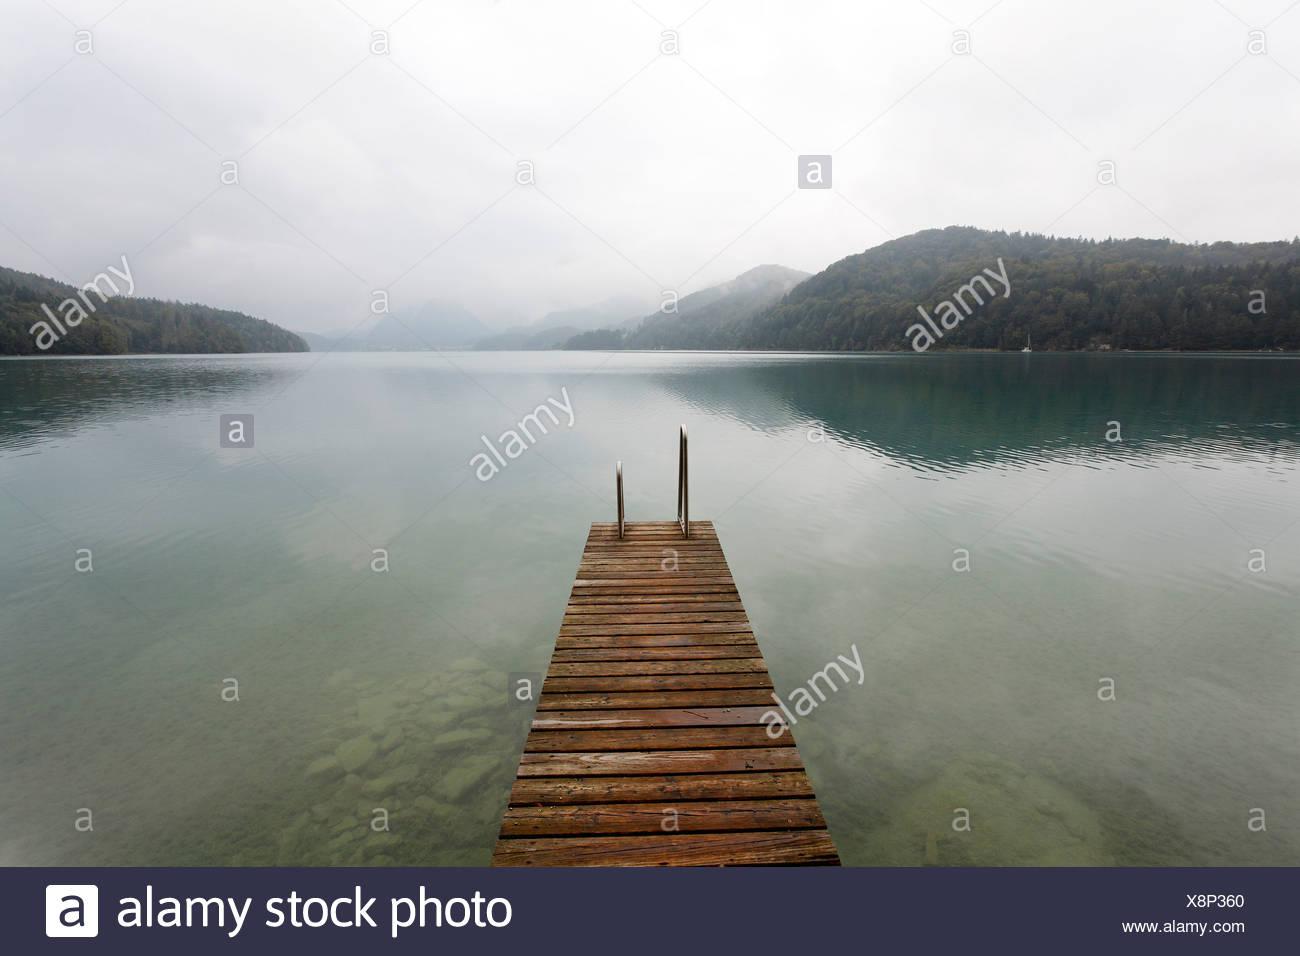 Wooden jetty juts into the Fuschlsee lake, overcast sky, rainy, dreary atmosphere, Salzkammergut area, Salzburger Land region,  - Stock Image